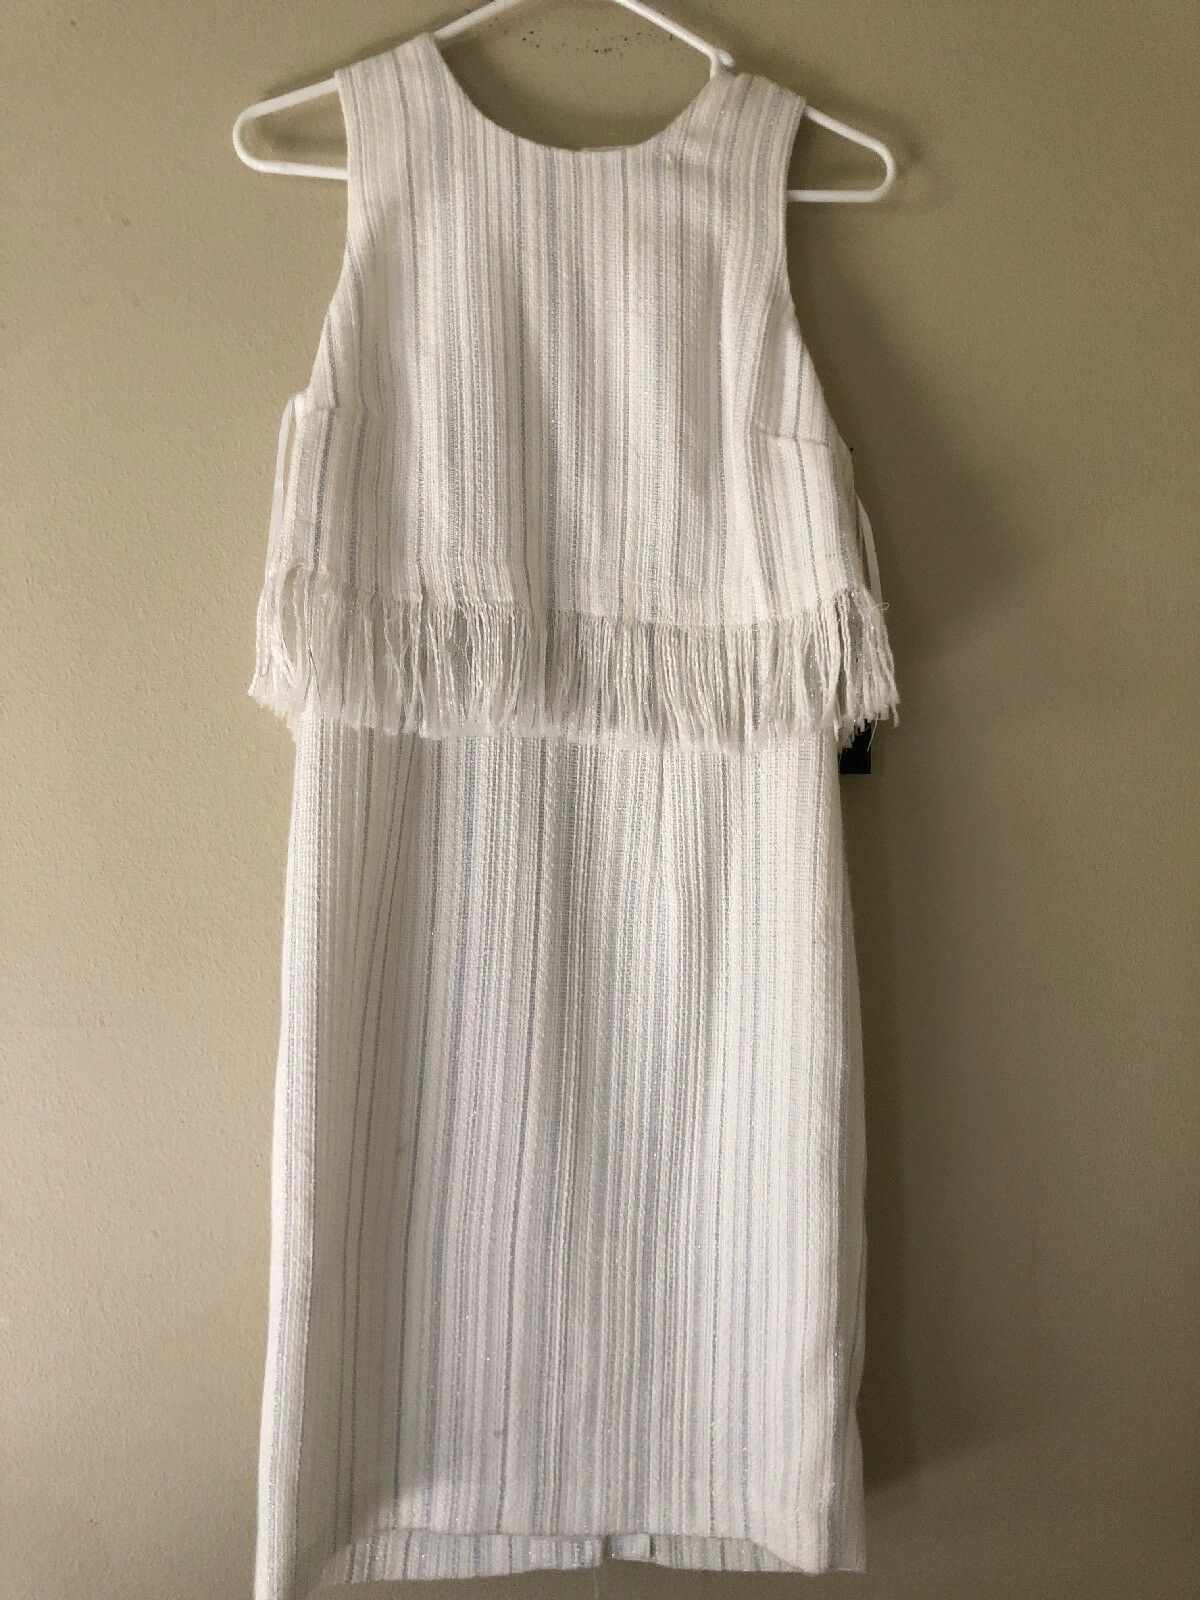 Karl Lagerfeld NEW White Ivory Women's Size 2 Knit Sheath Dress  152 278